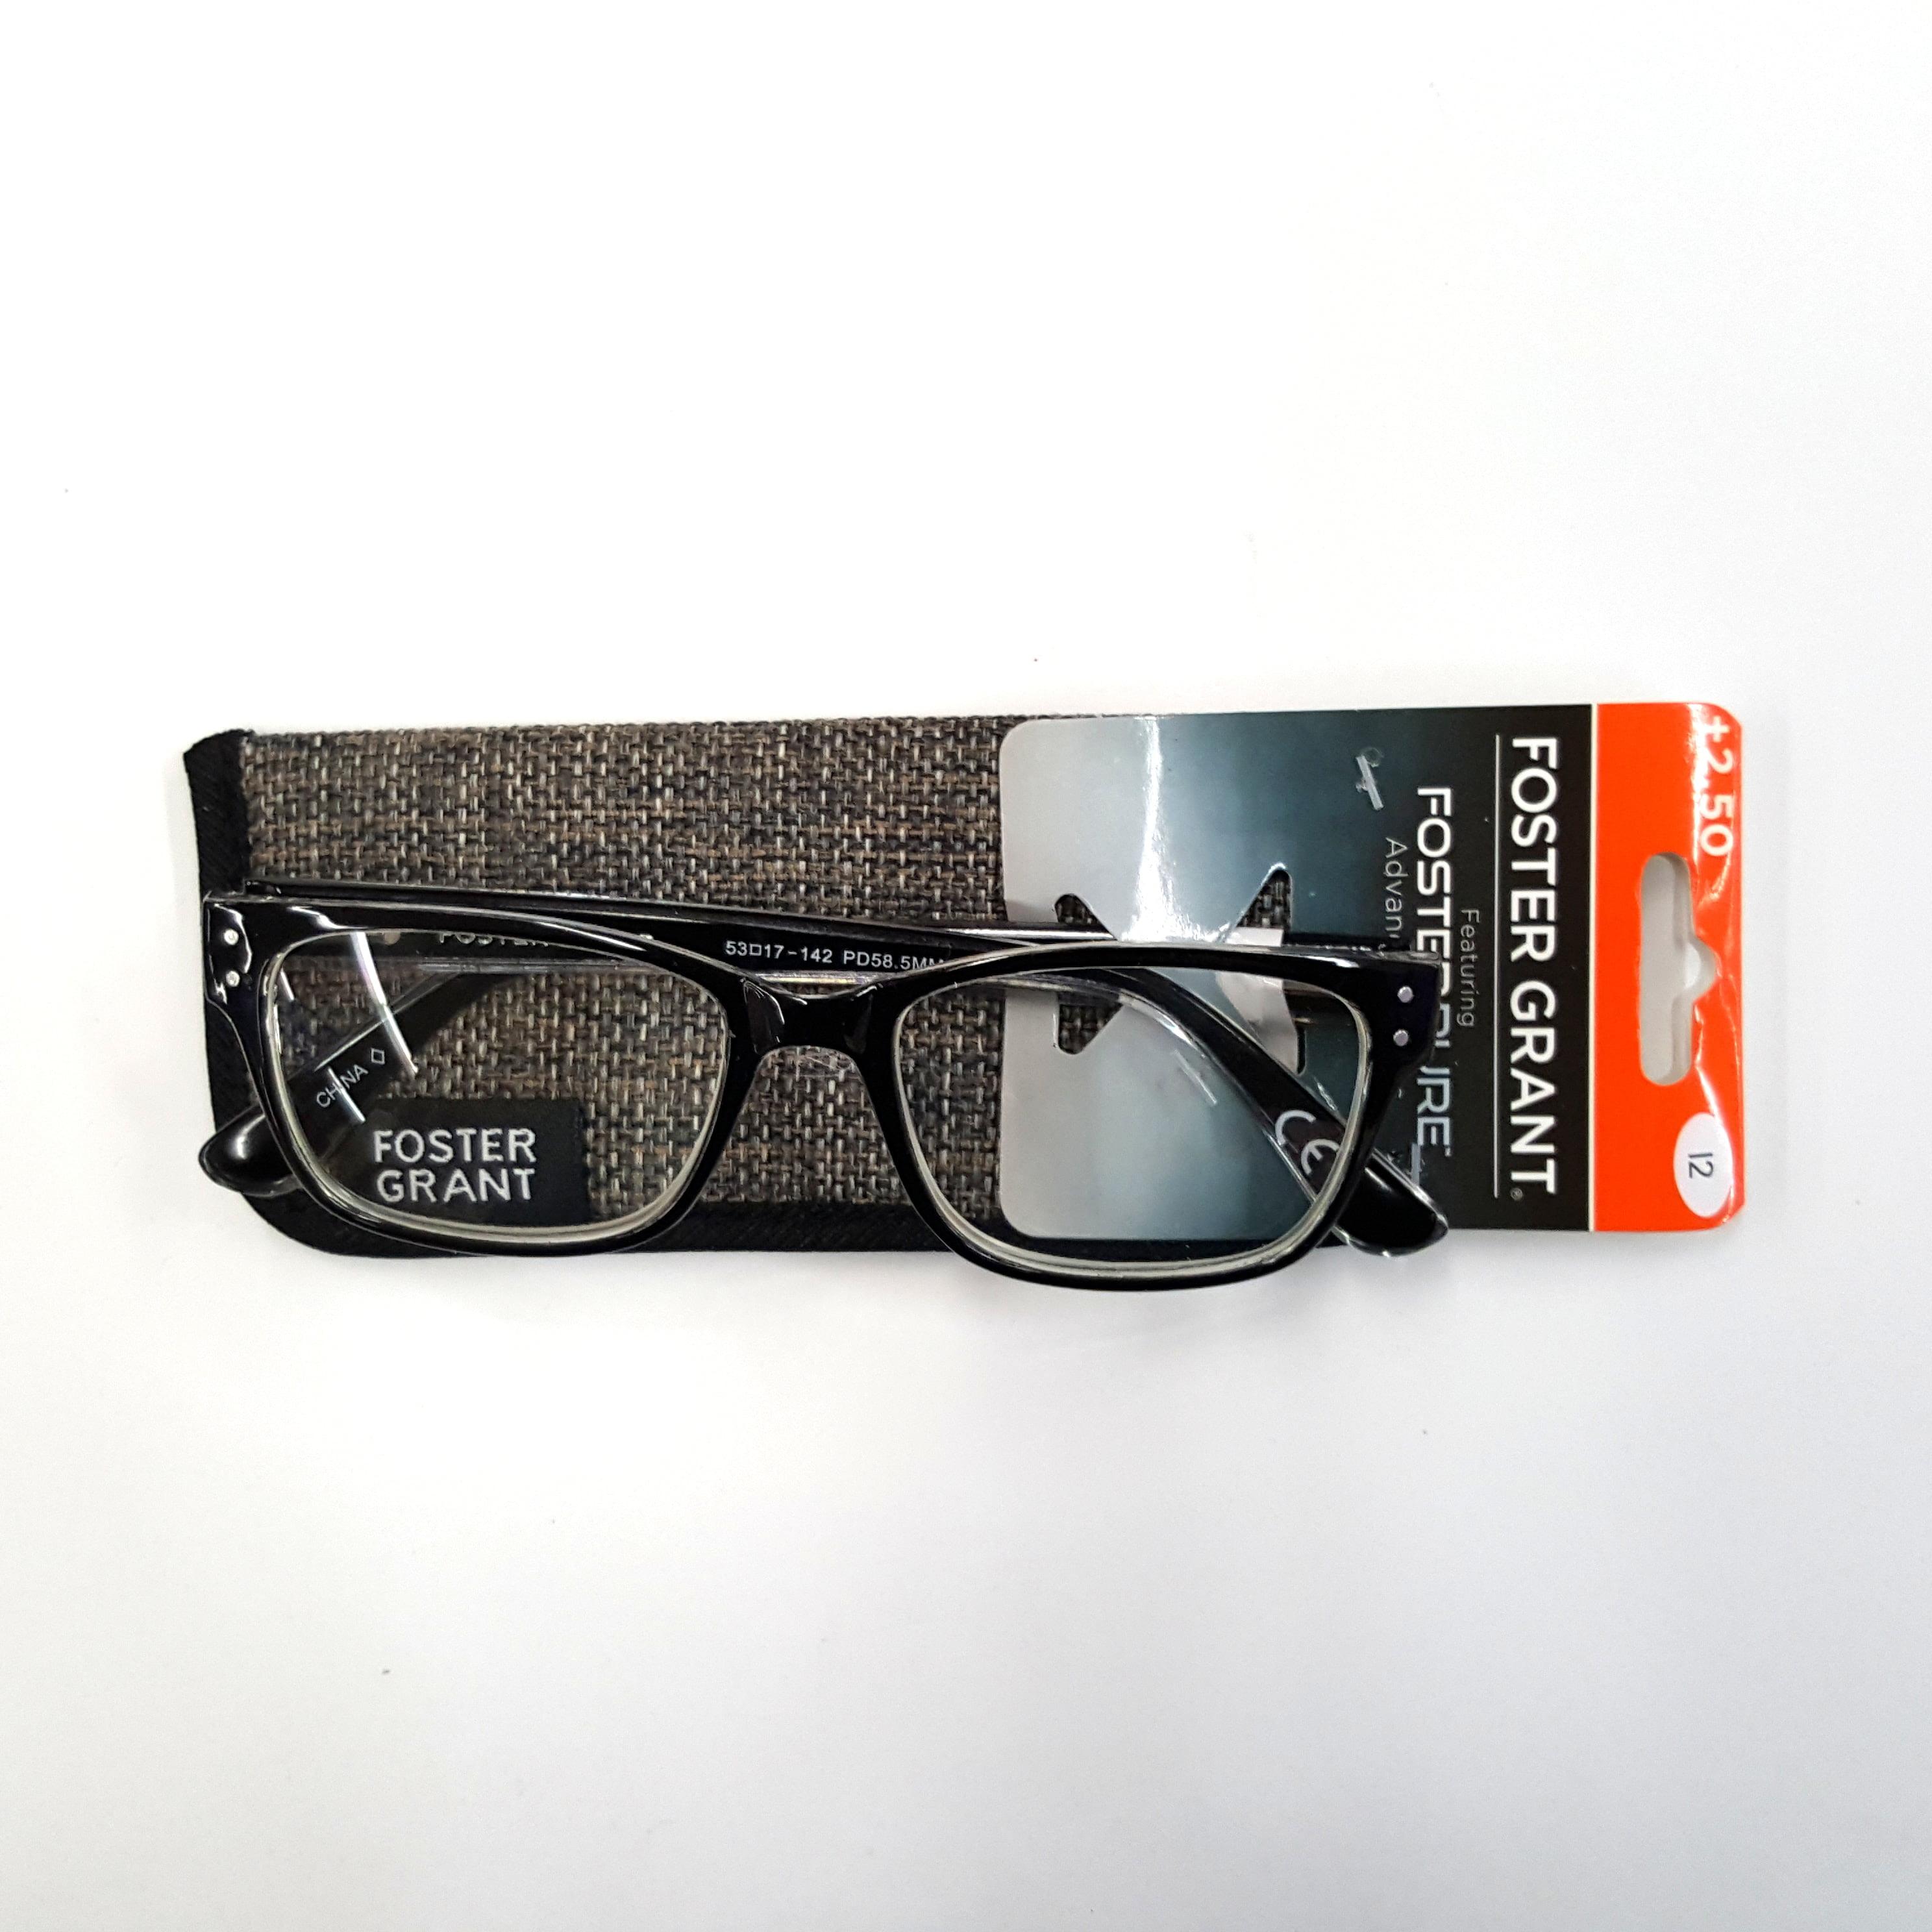 Fgx Reading Glass 250 Diopter Eyesential Eyebrush Set